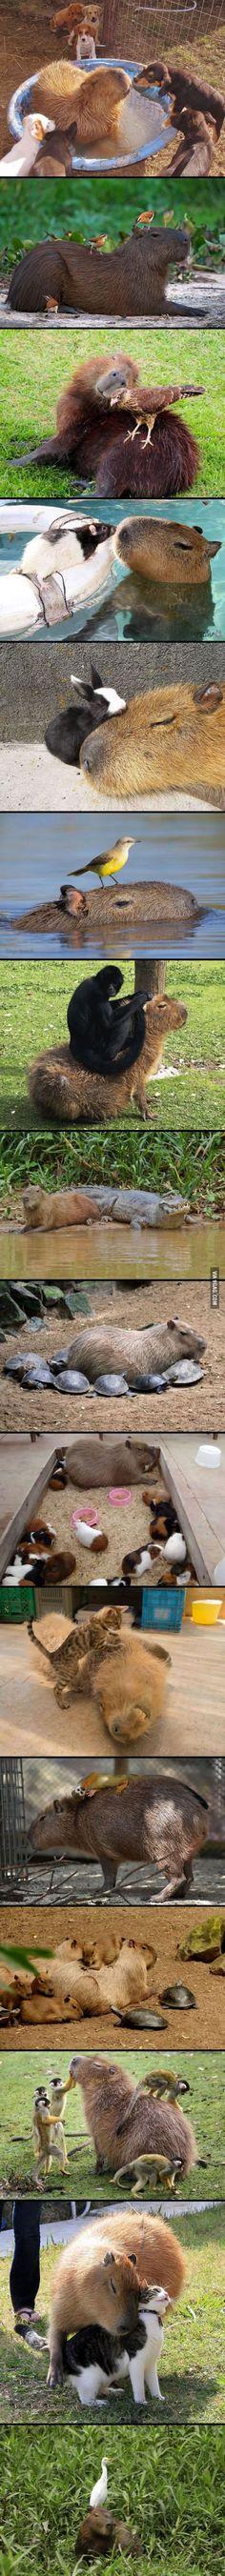 Capybaras make friends with everyone